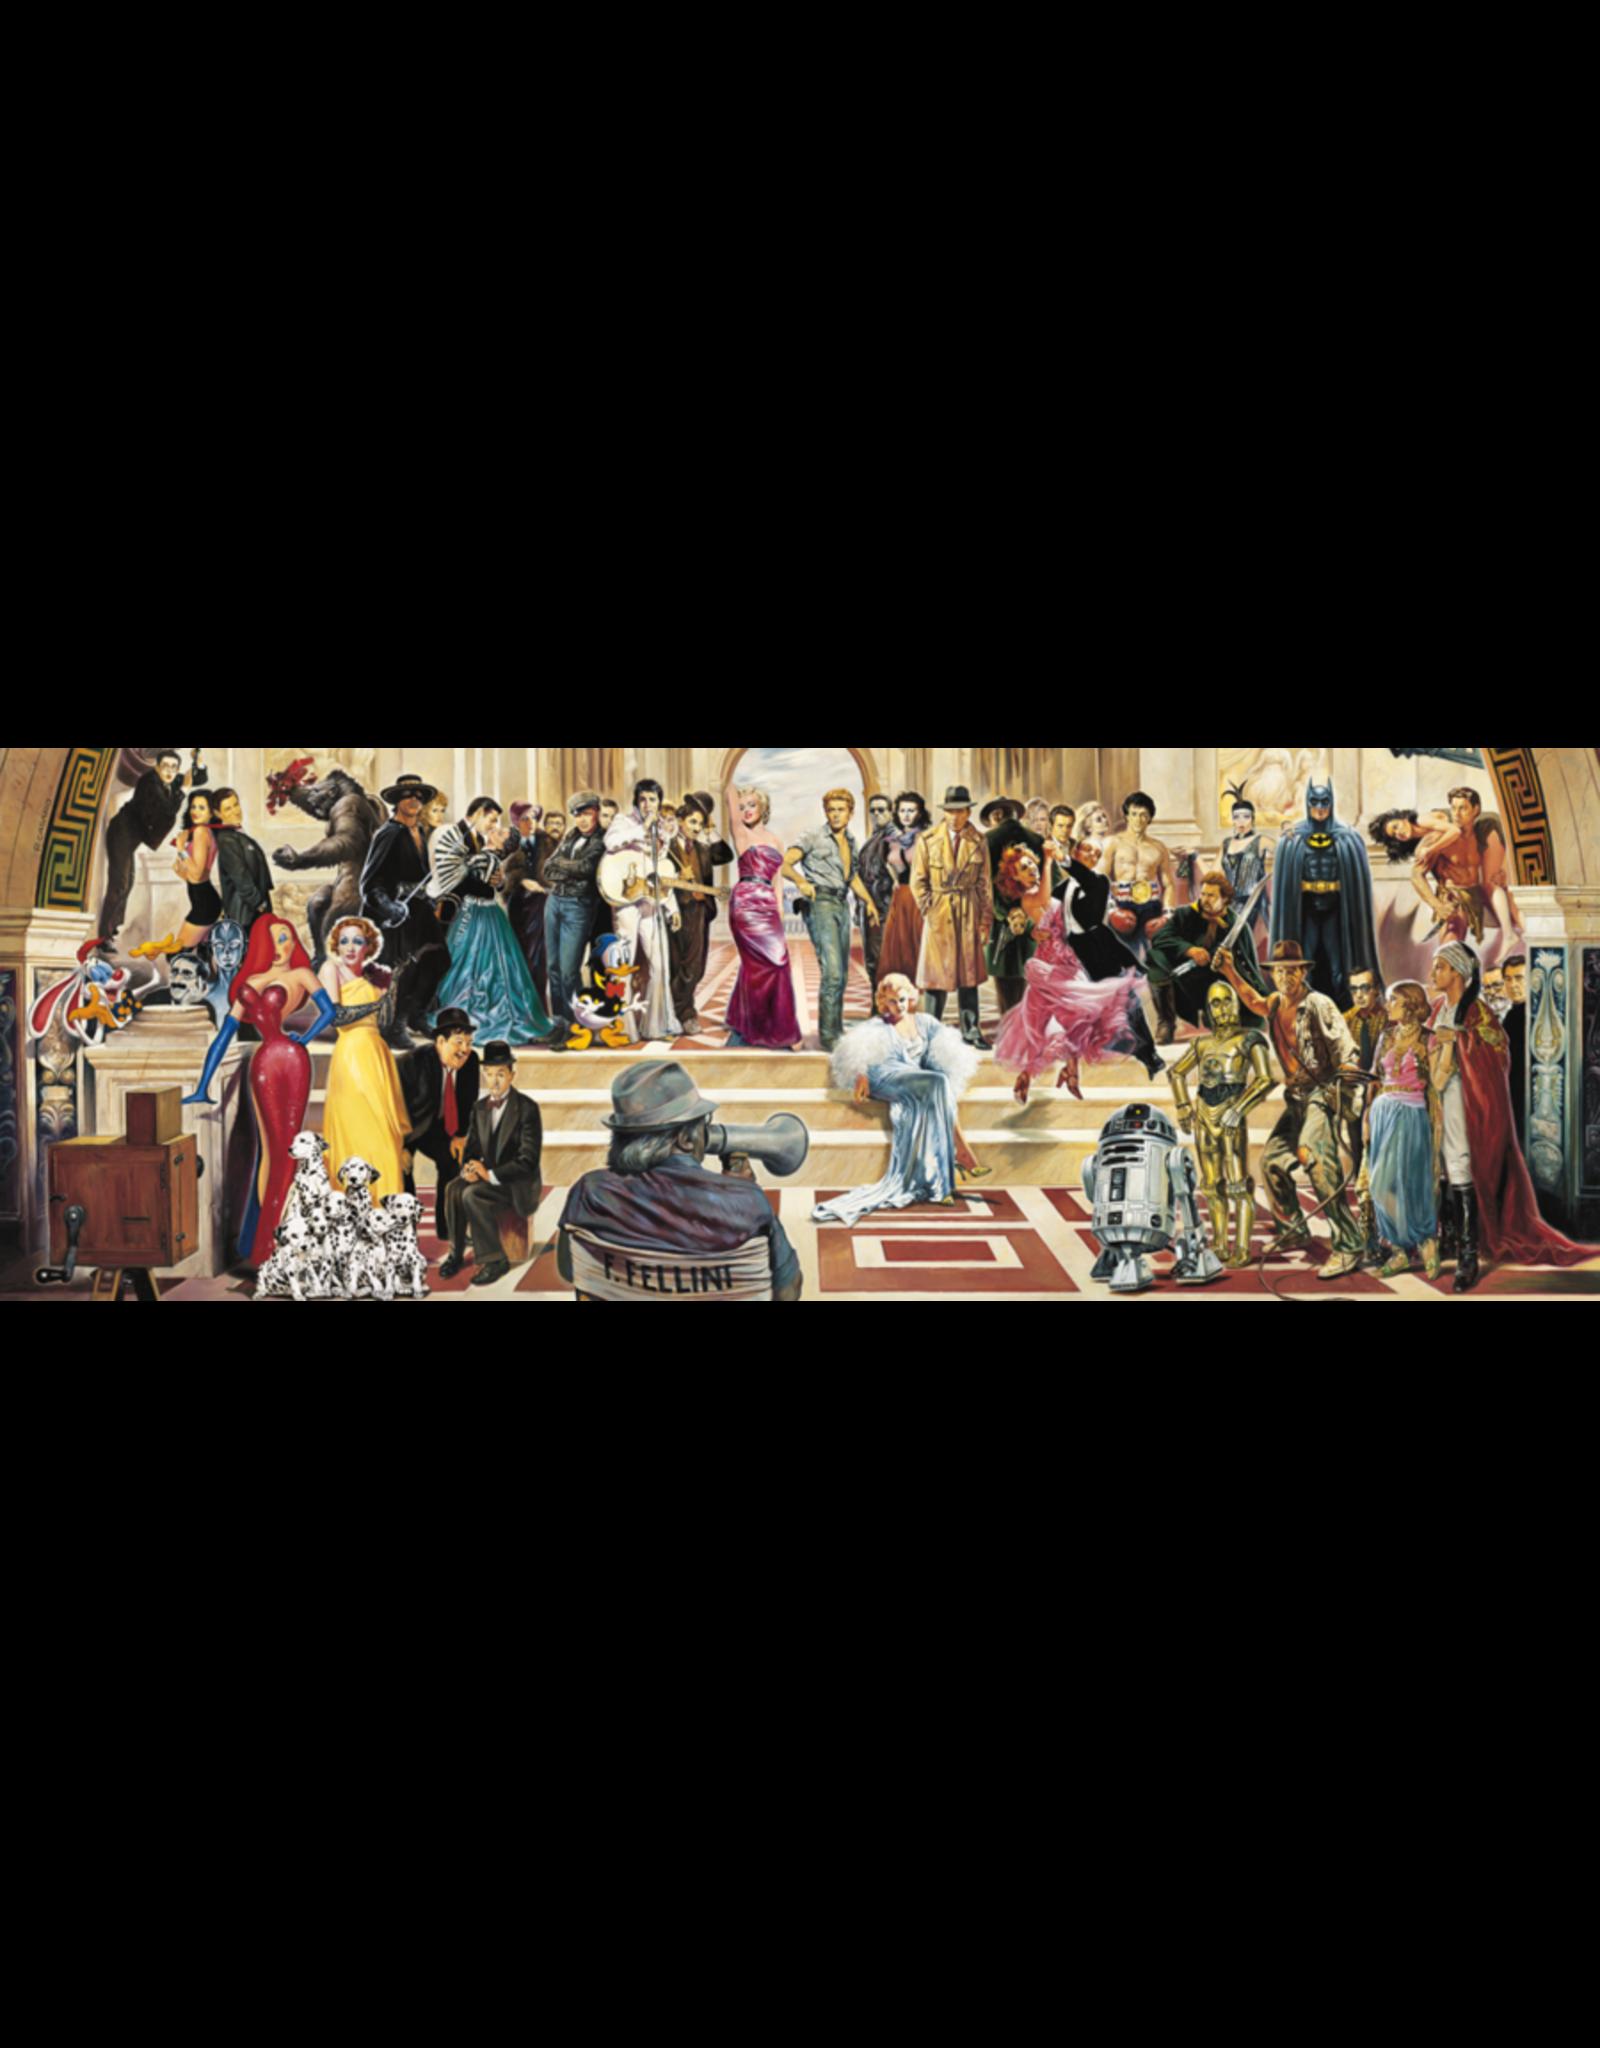 Schmidt 100 Years of Film Panorama 1000pc Puzzle